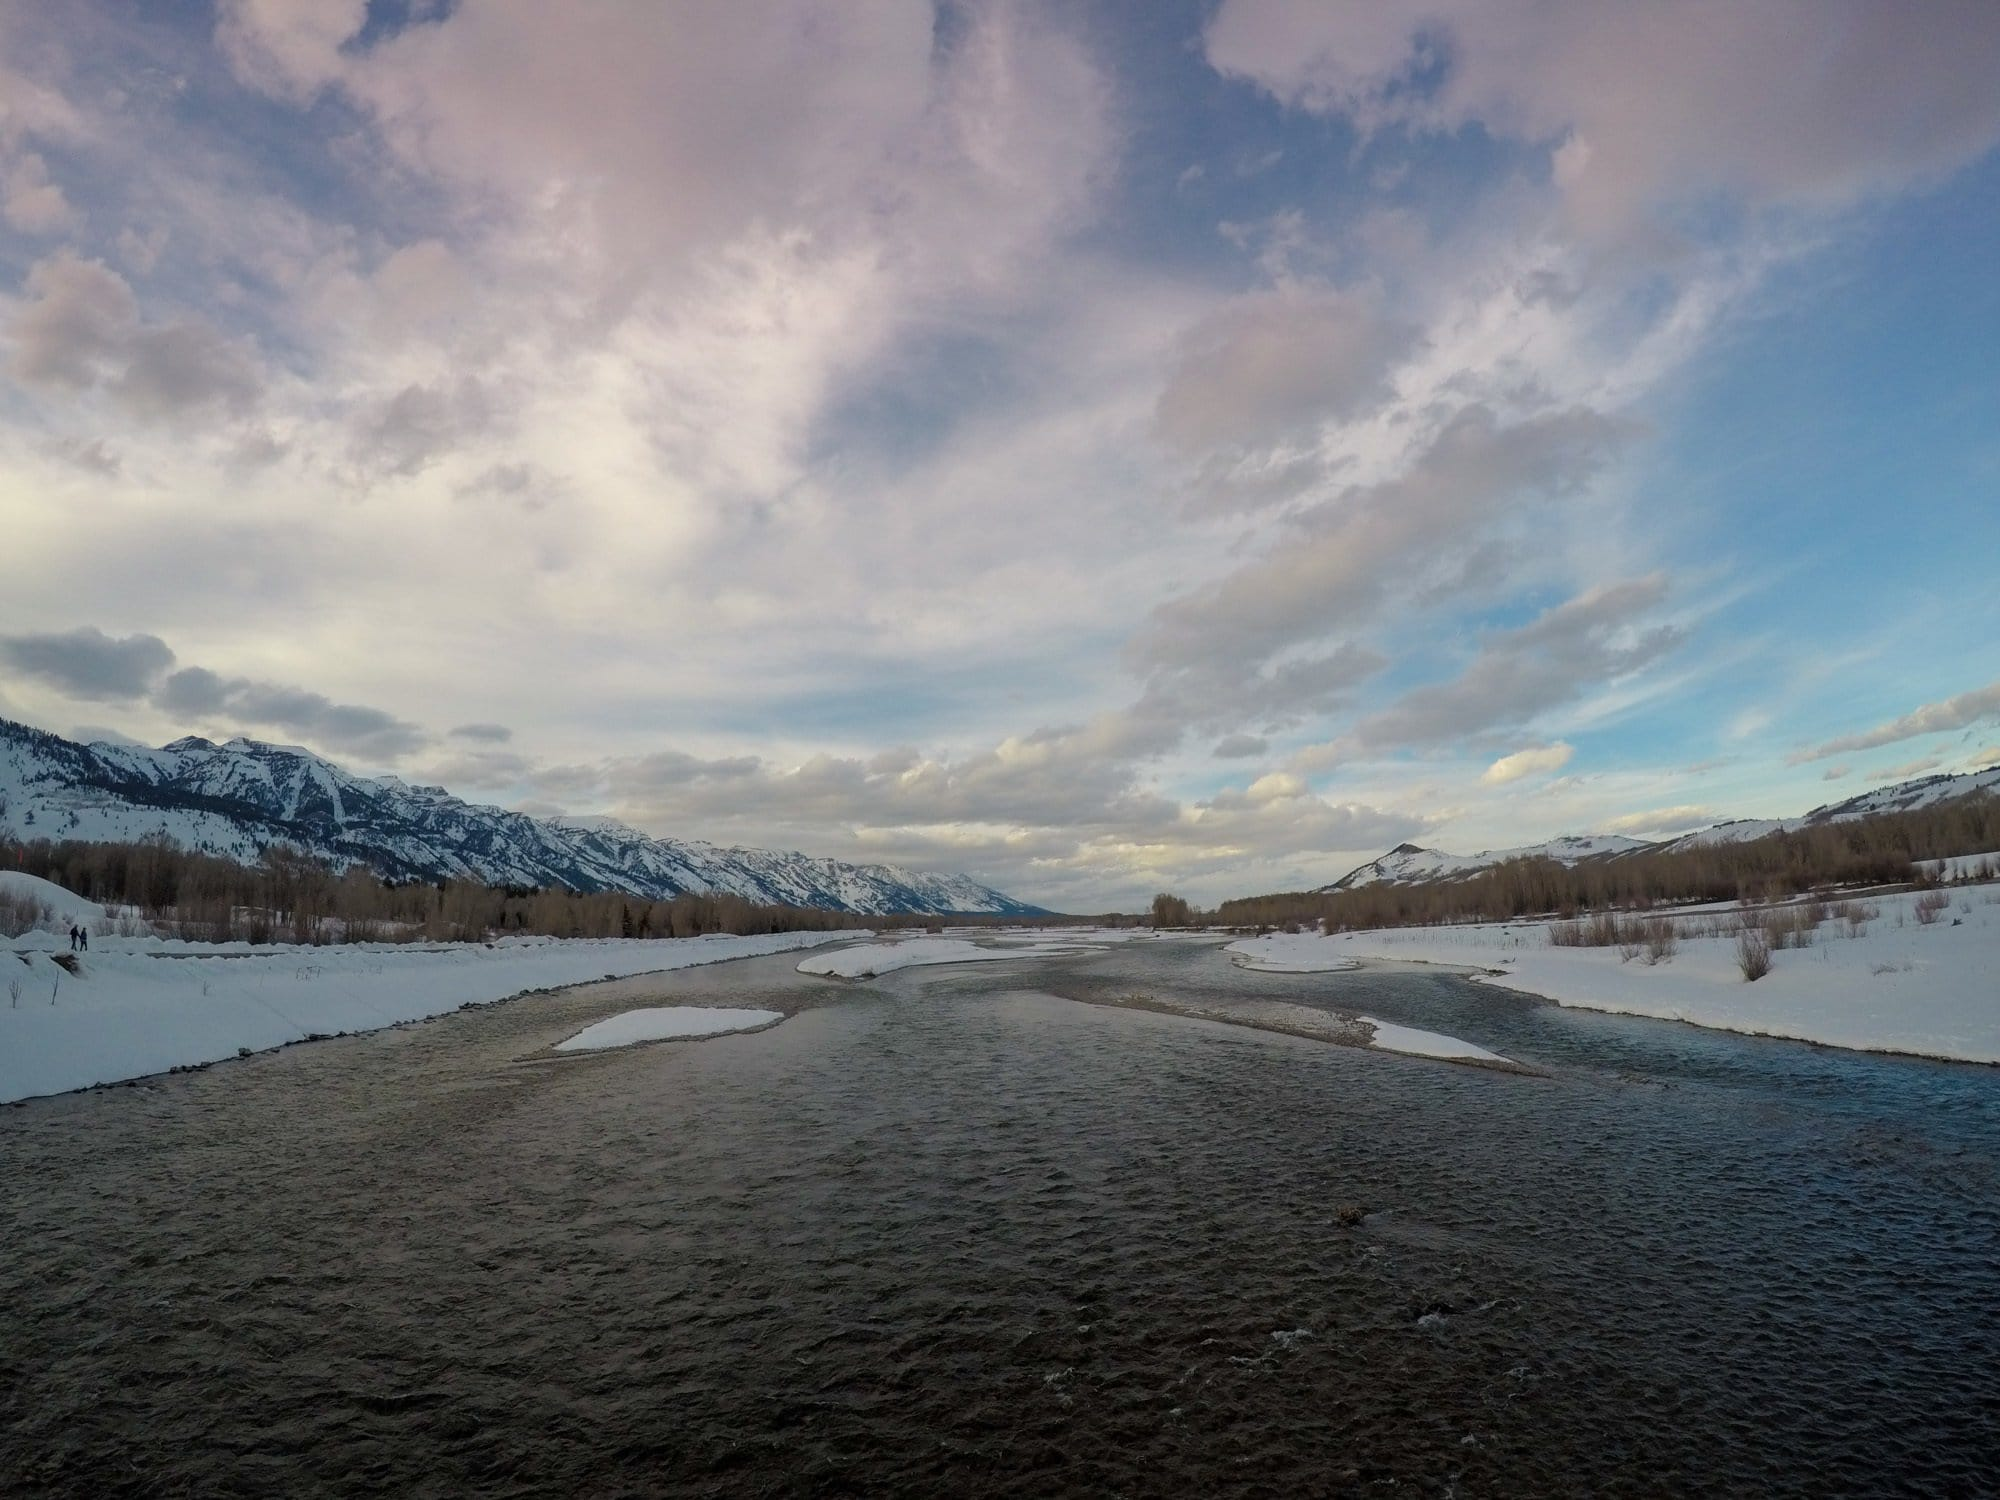 Bridge over the Snake River in Jackson, Wyoming